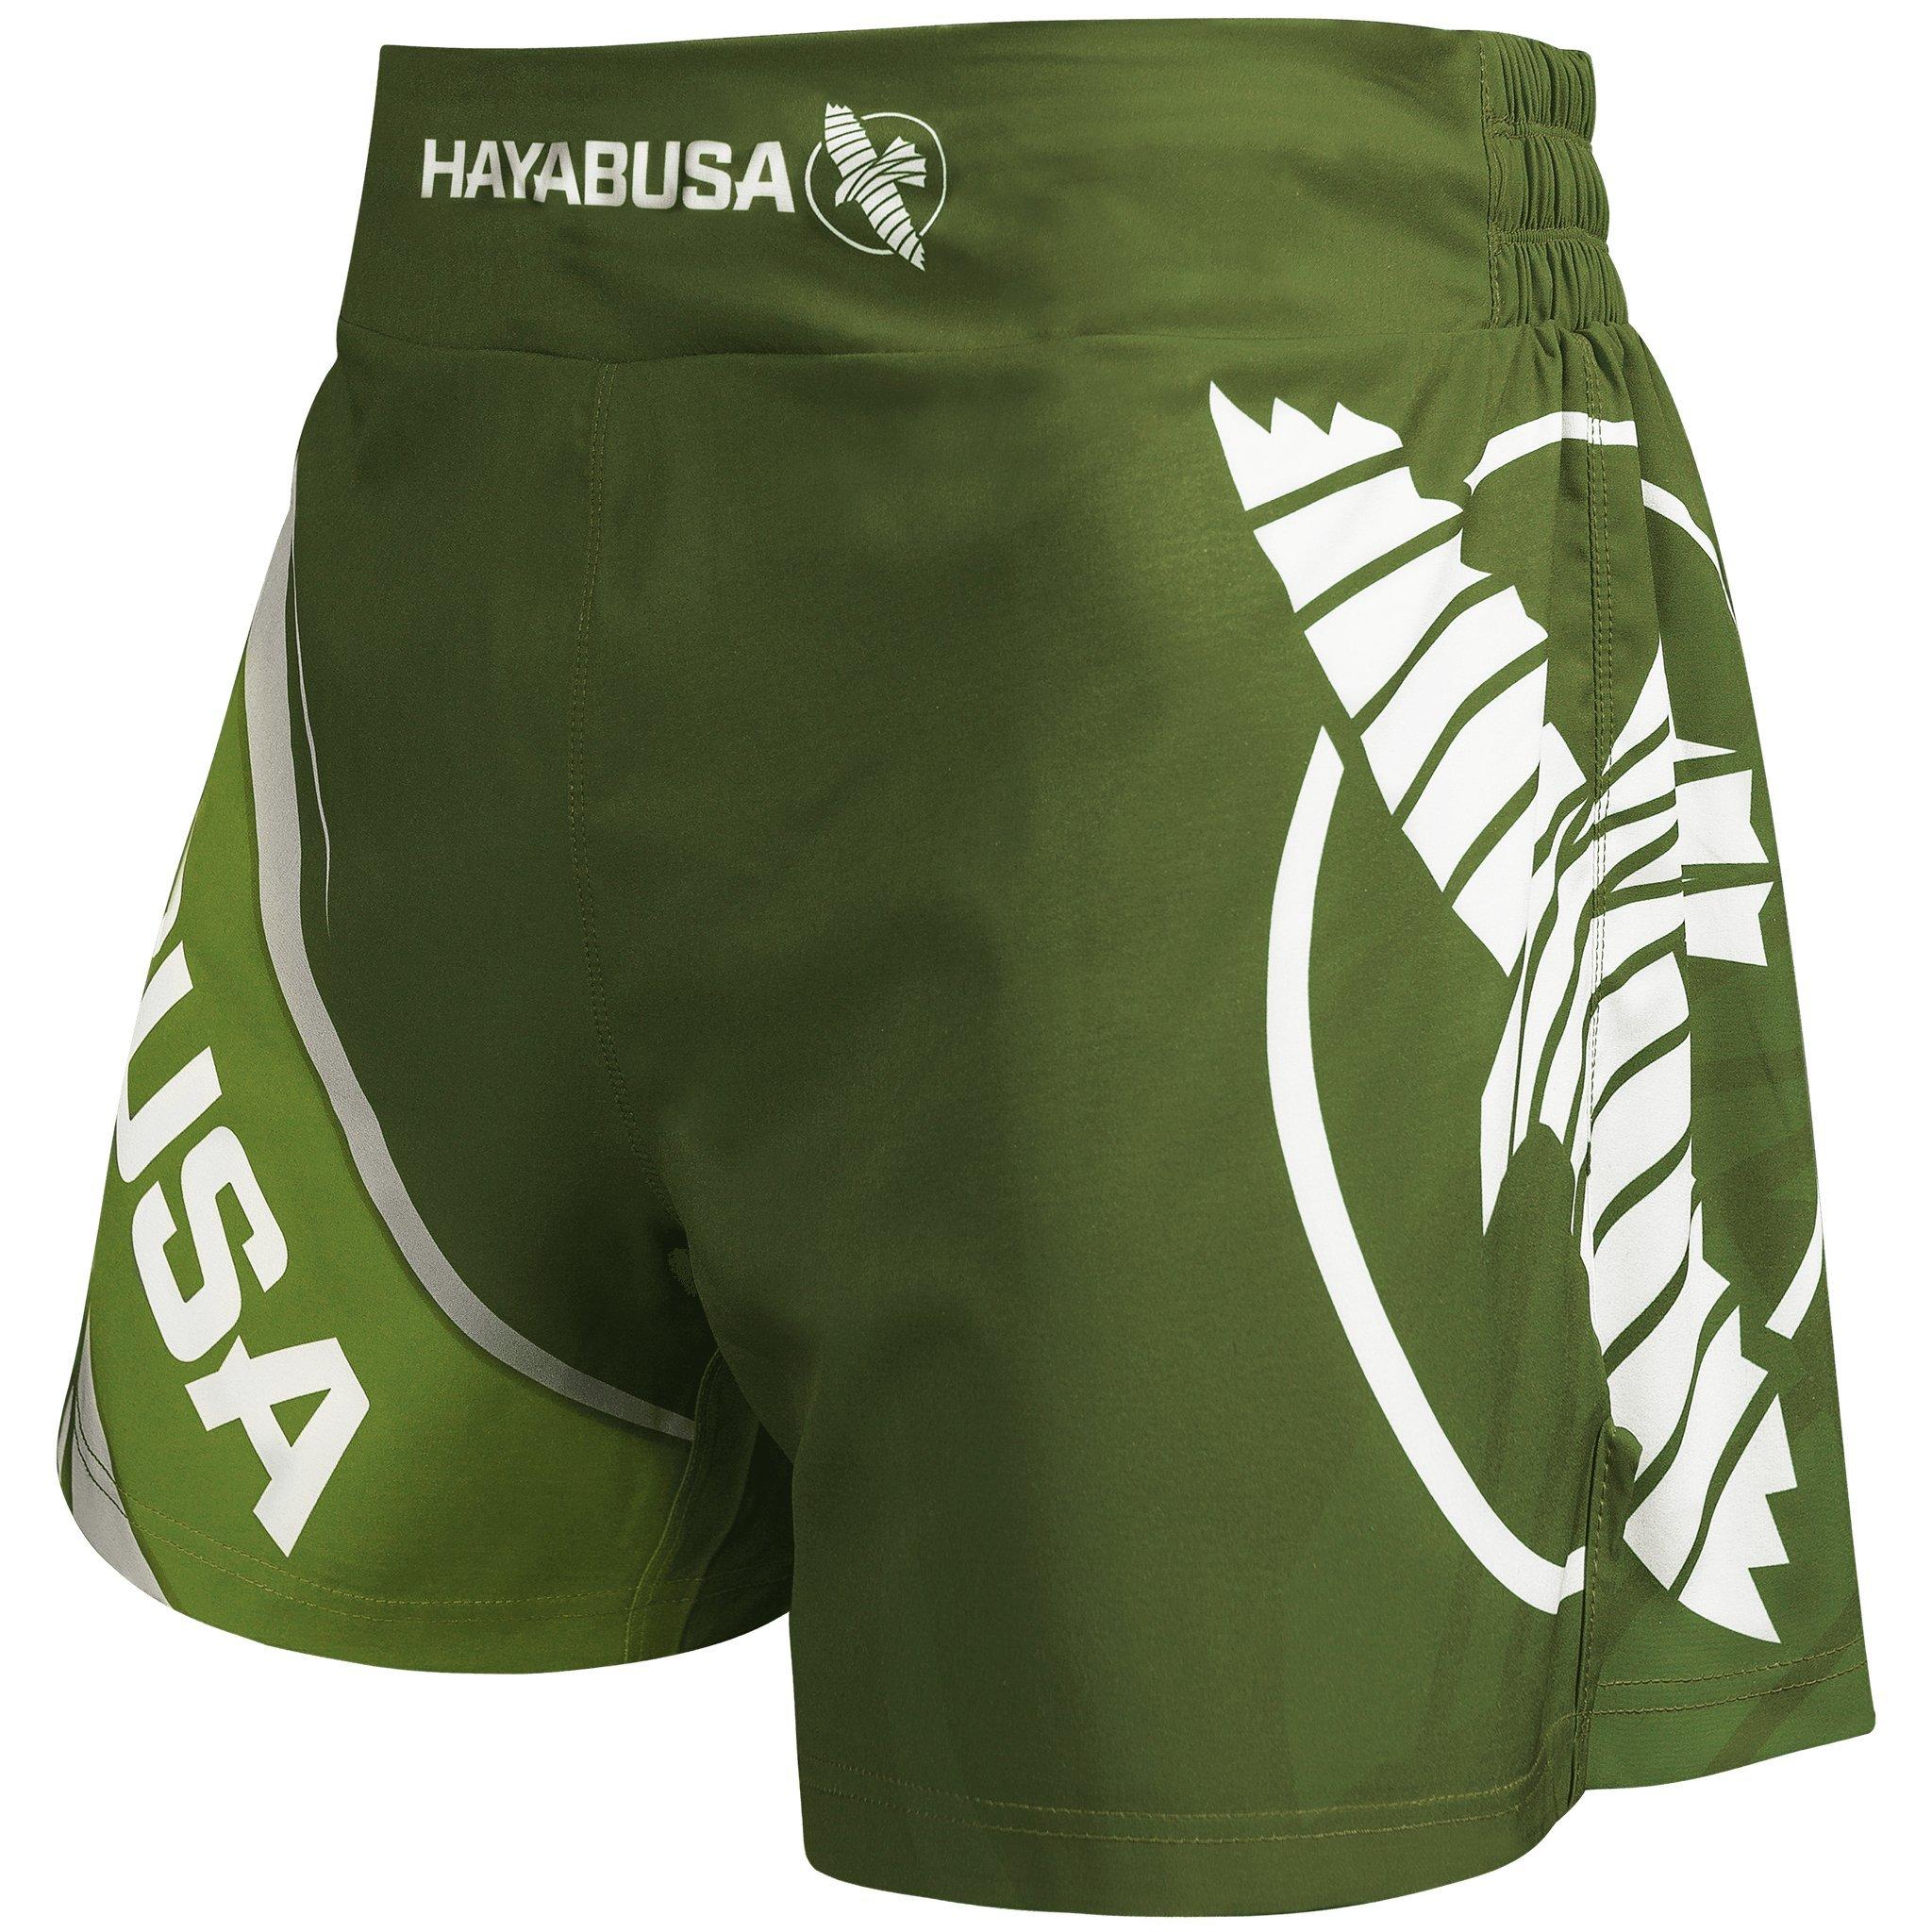 Hayabusa Kickboxing MMA Shorts (32, Green) by Hayabusa